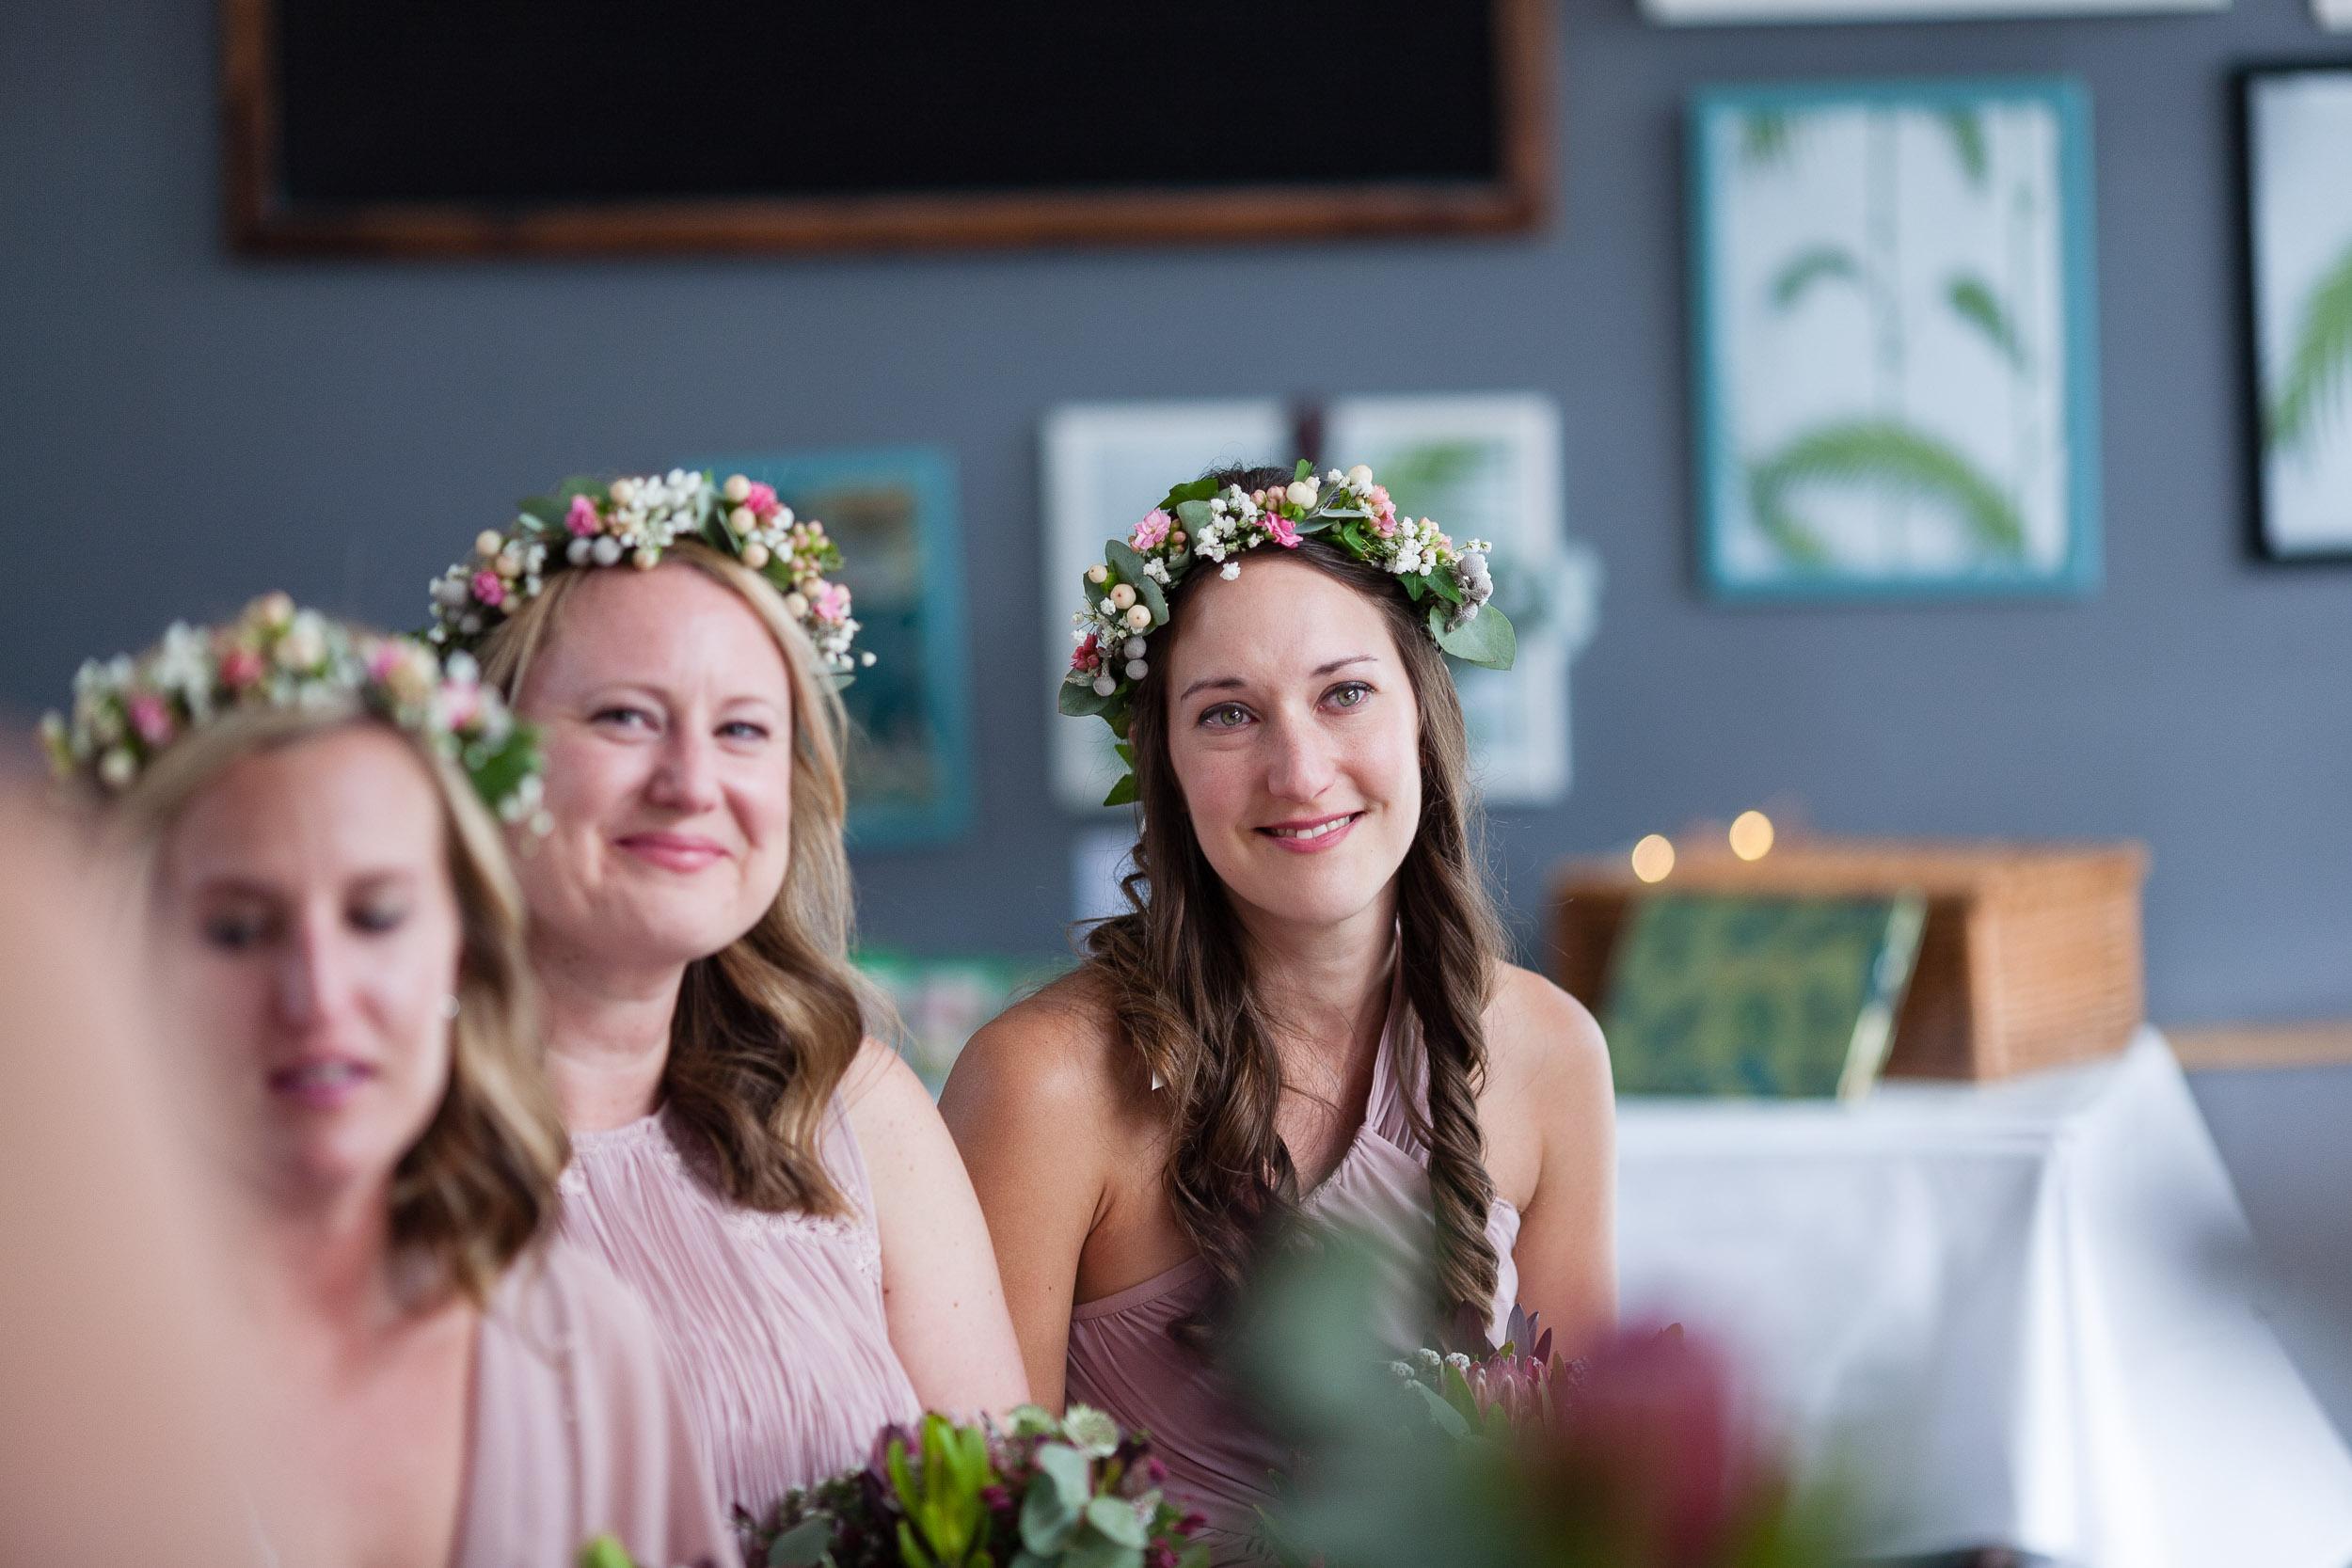 brockwell-lido-brixton-herne-hill-wedding-143.jpg